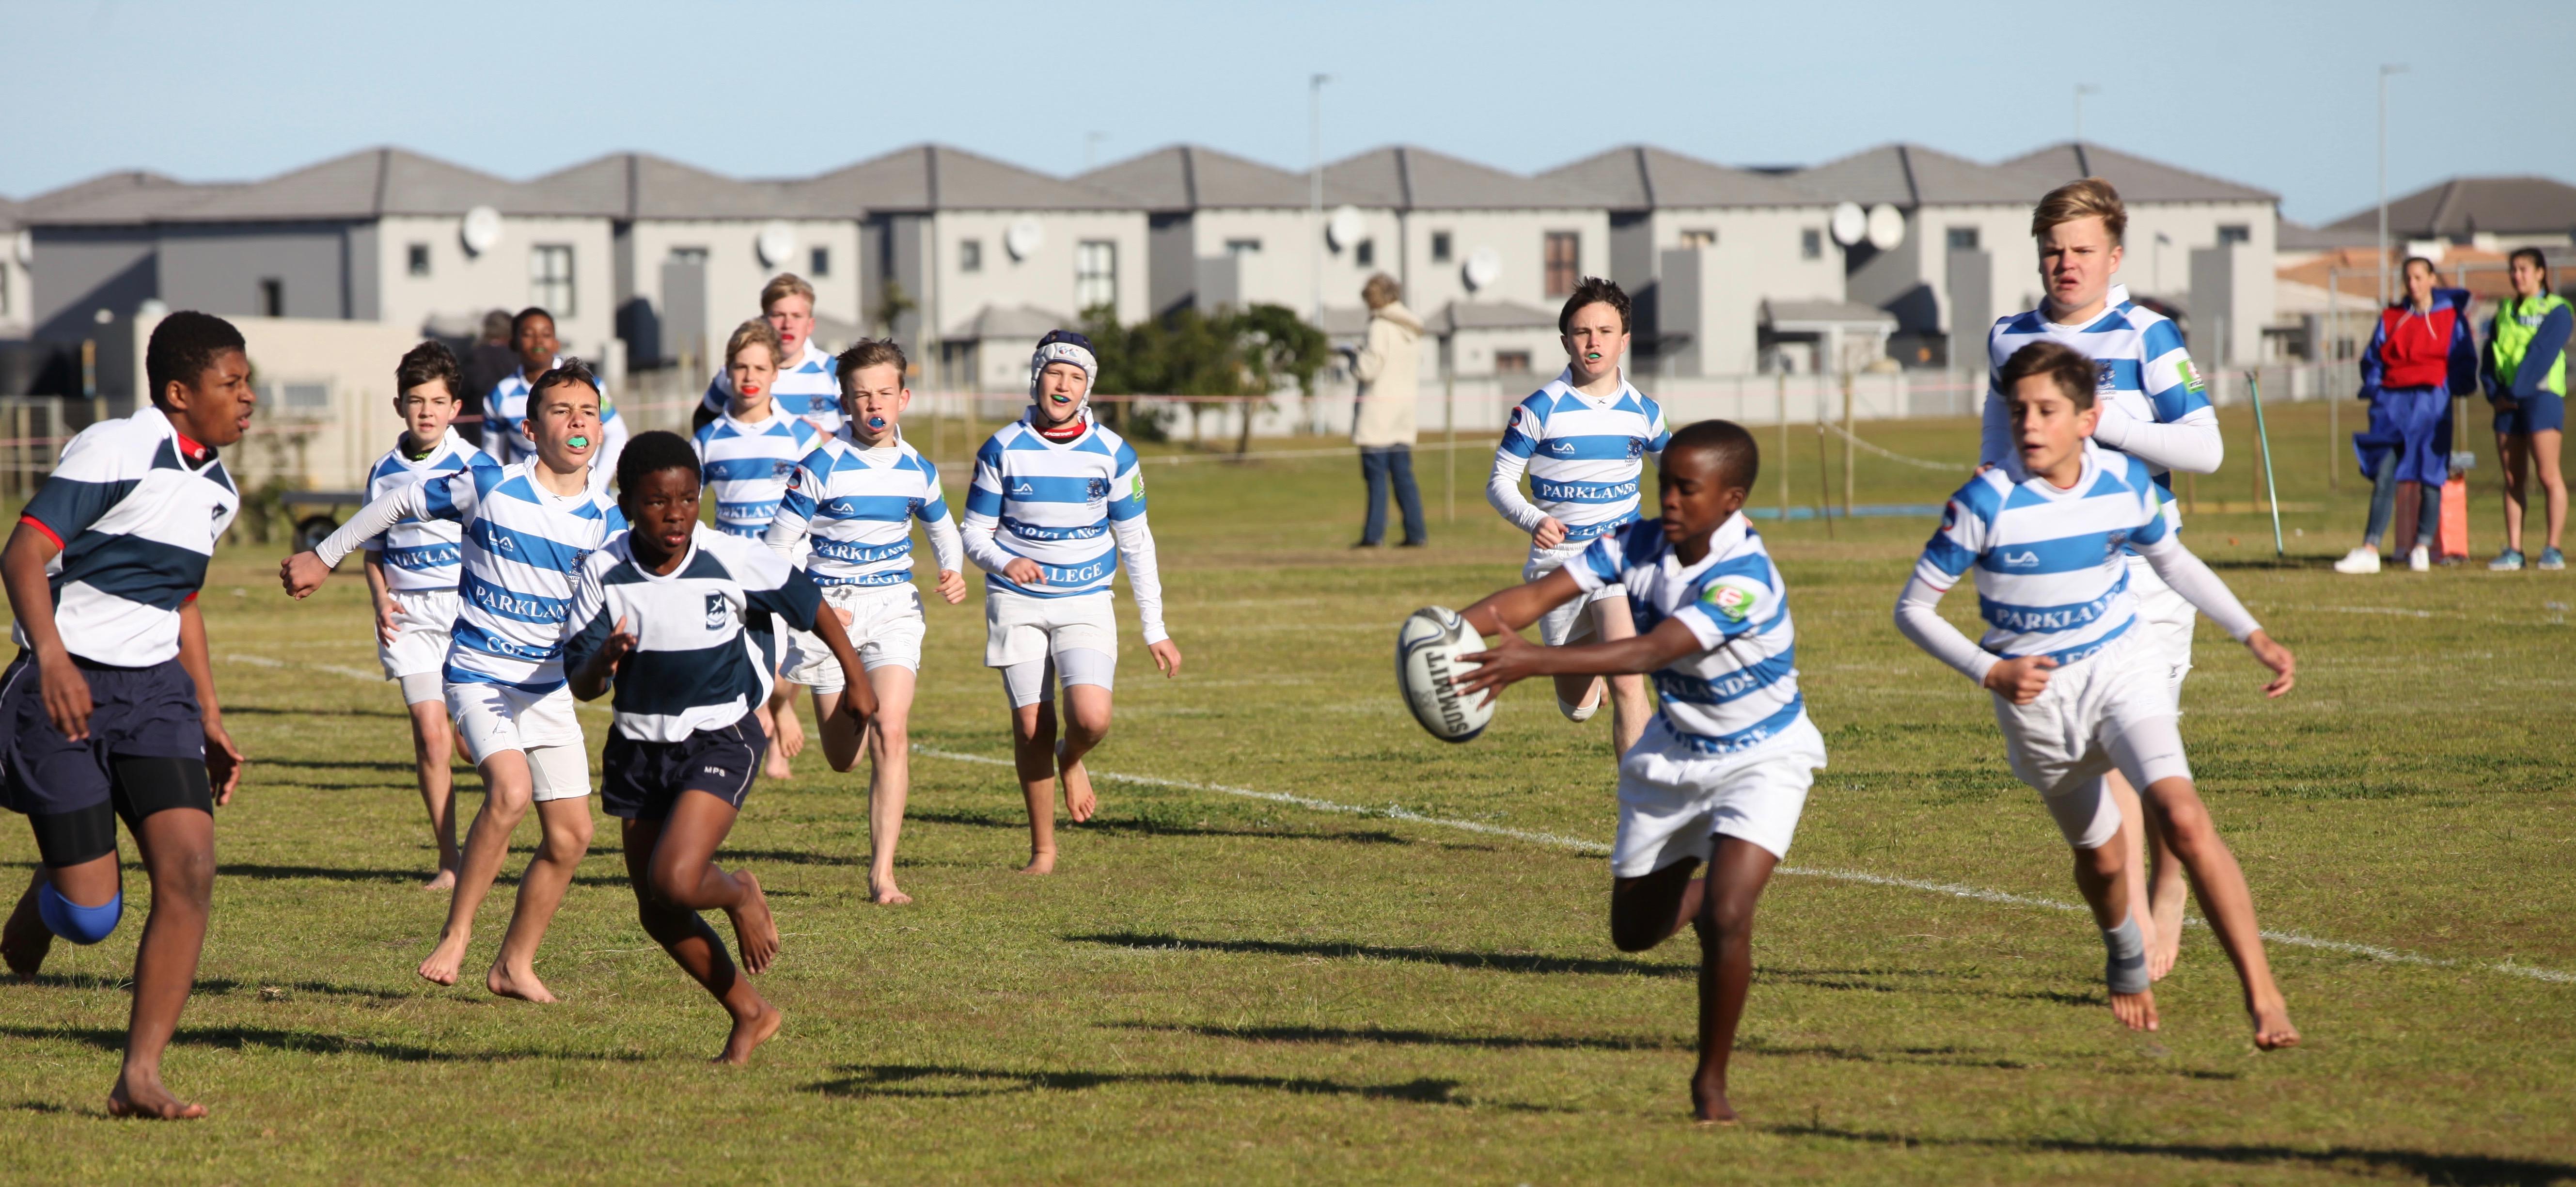 Parklands College Senior Preparatory Rugby 11